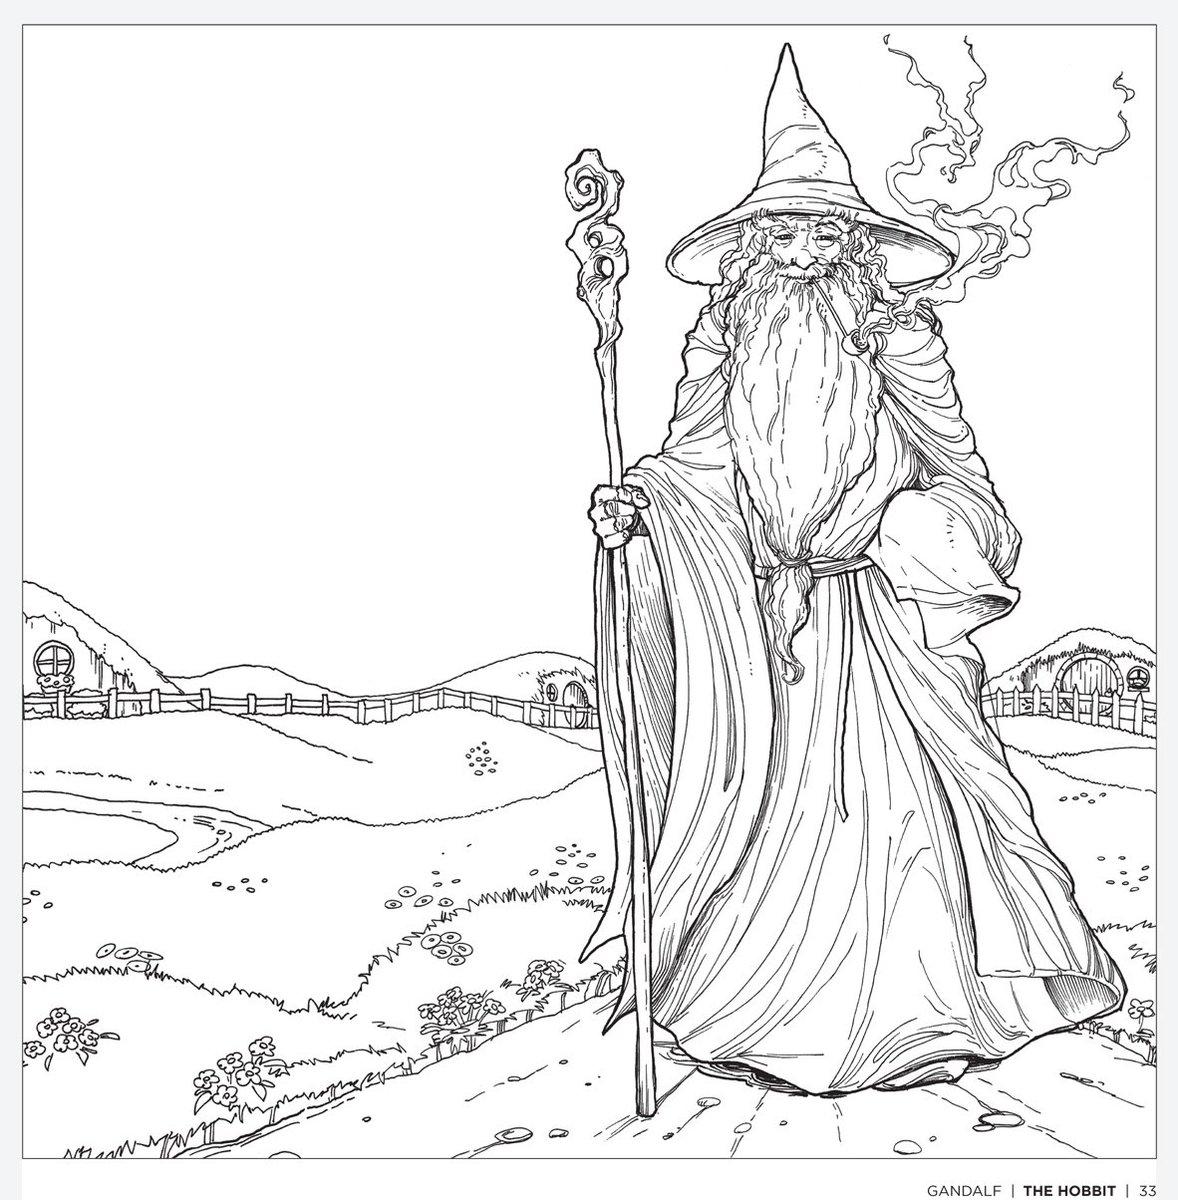 World Hobbit Project on Twitter: